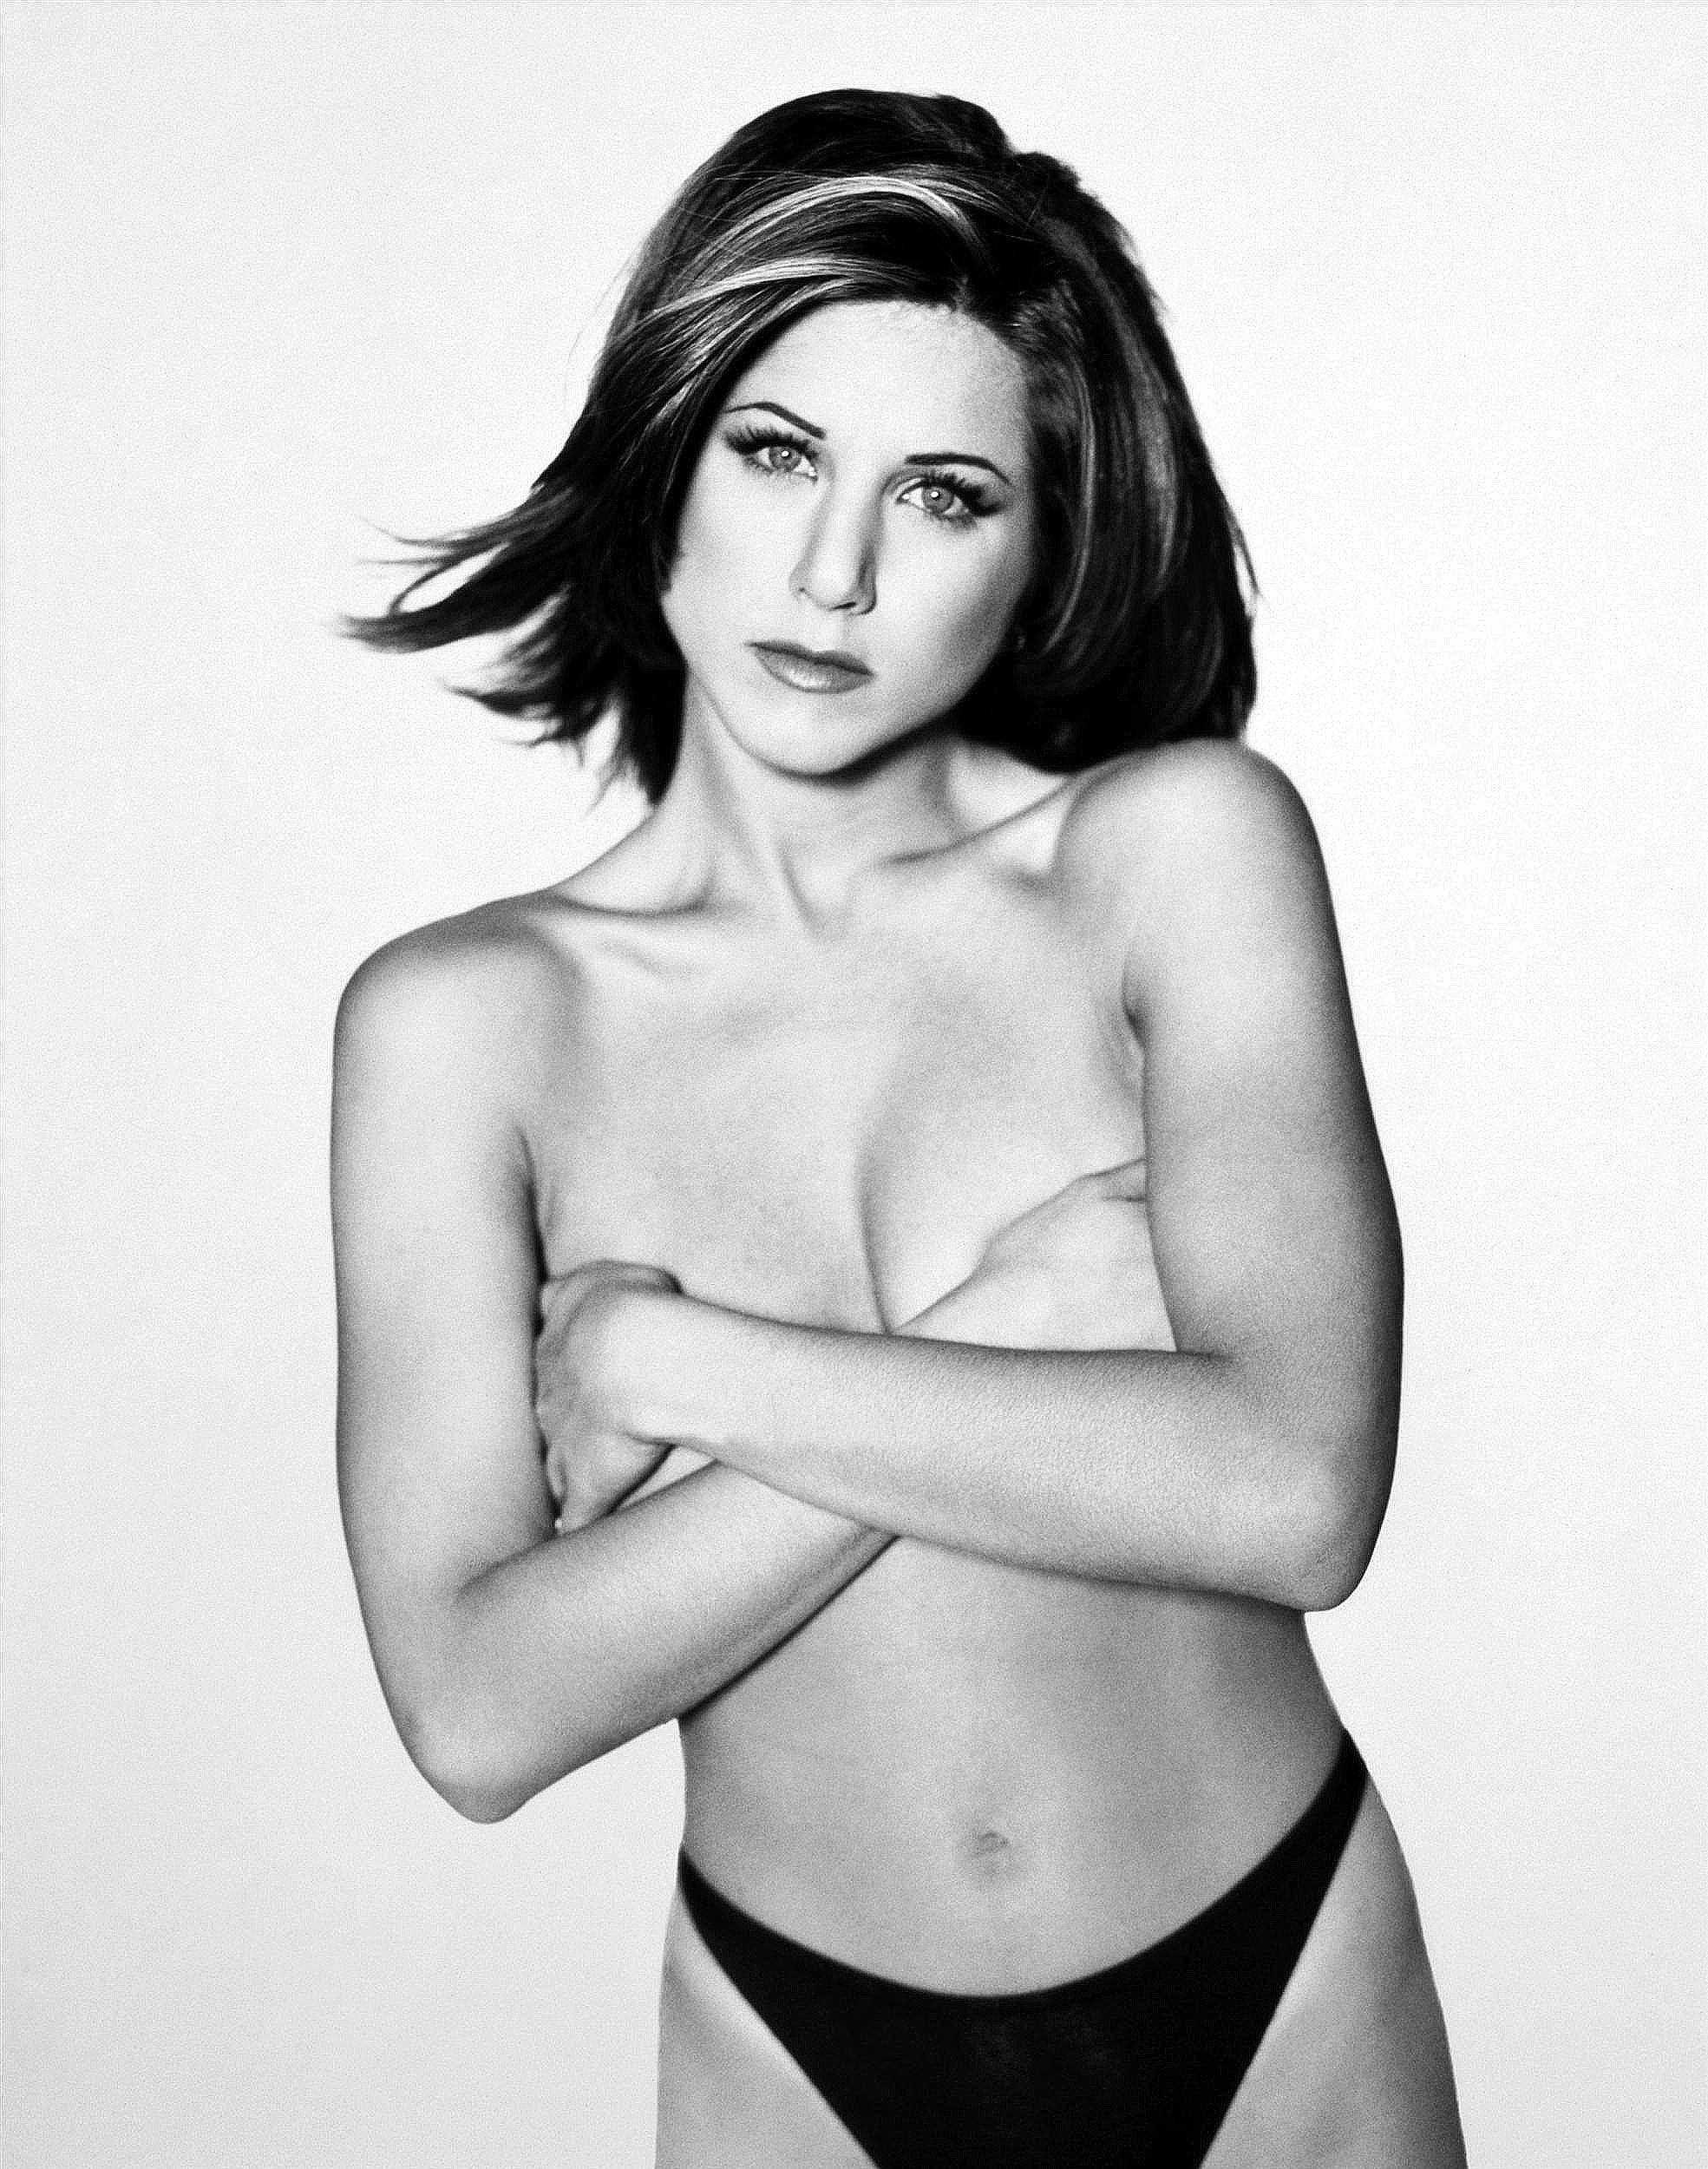 Jennifer Aniston topless pic